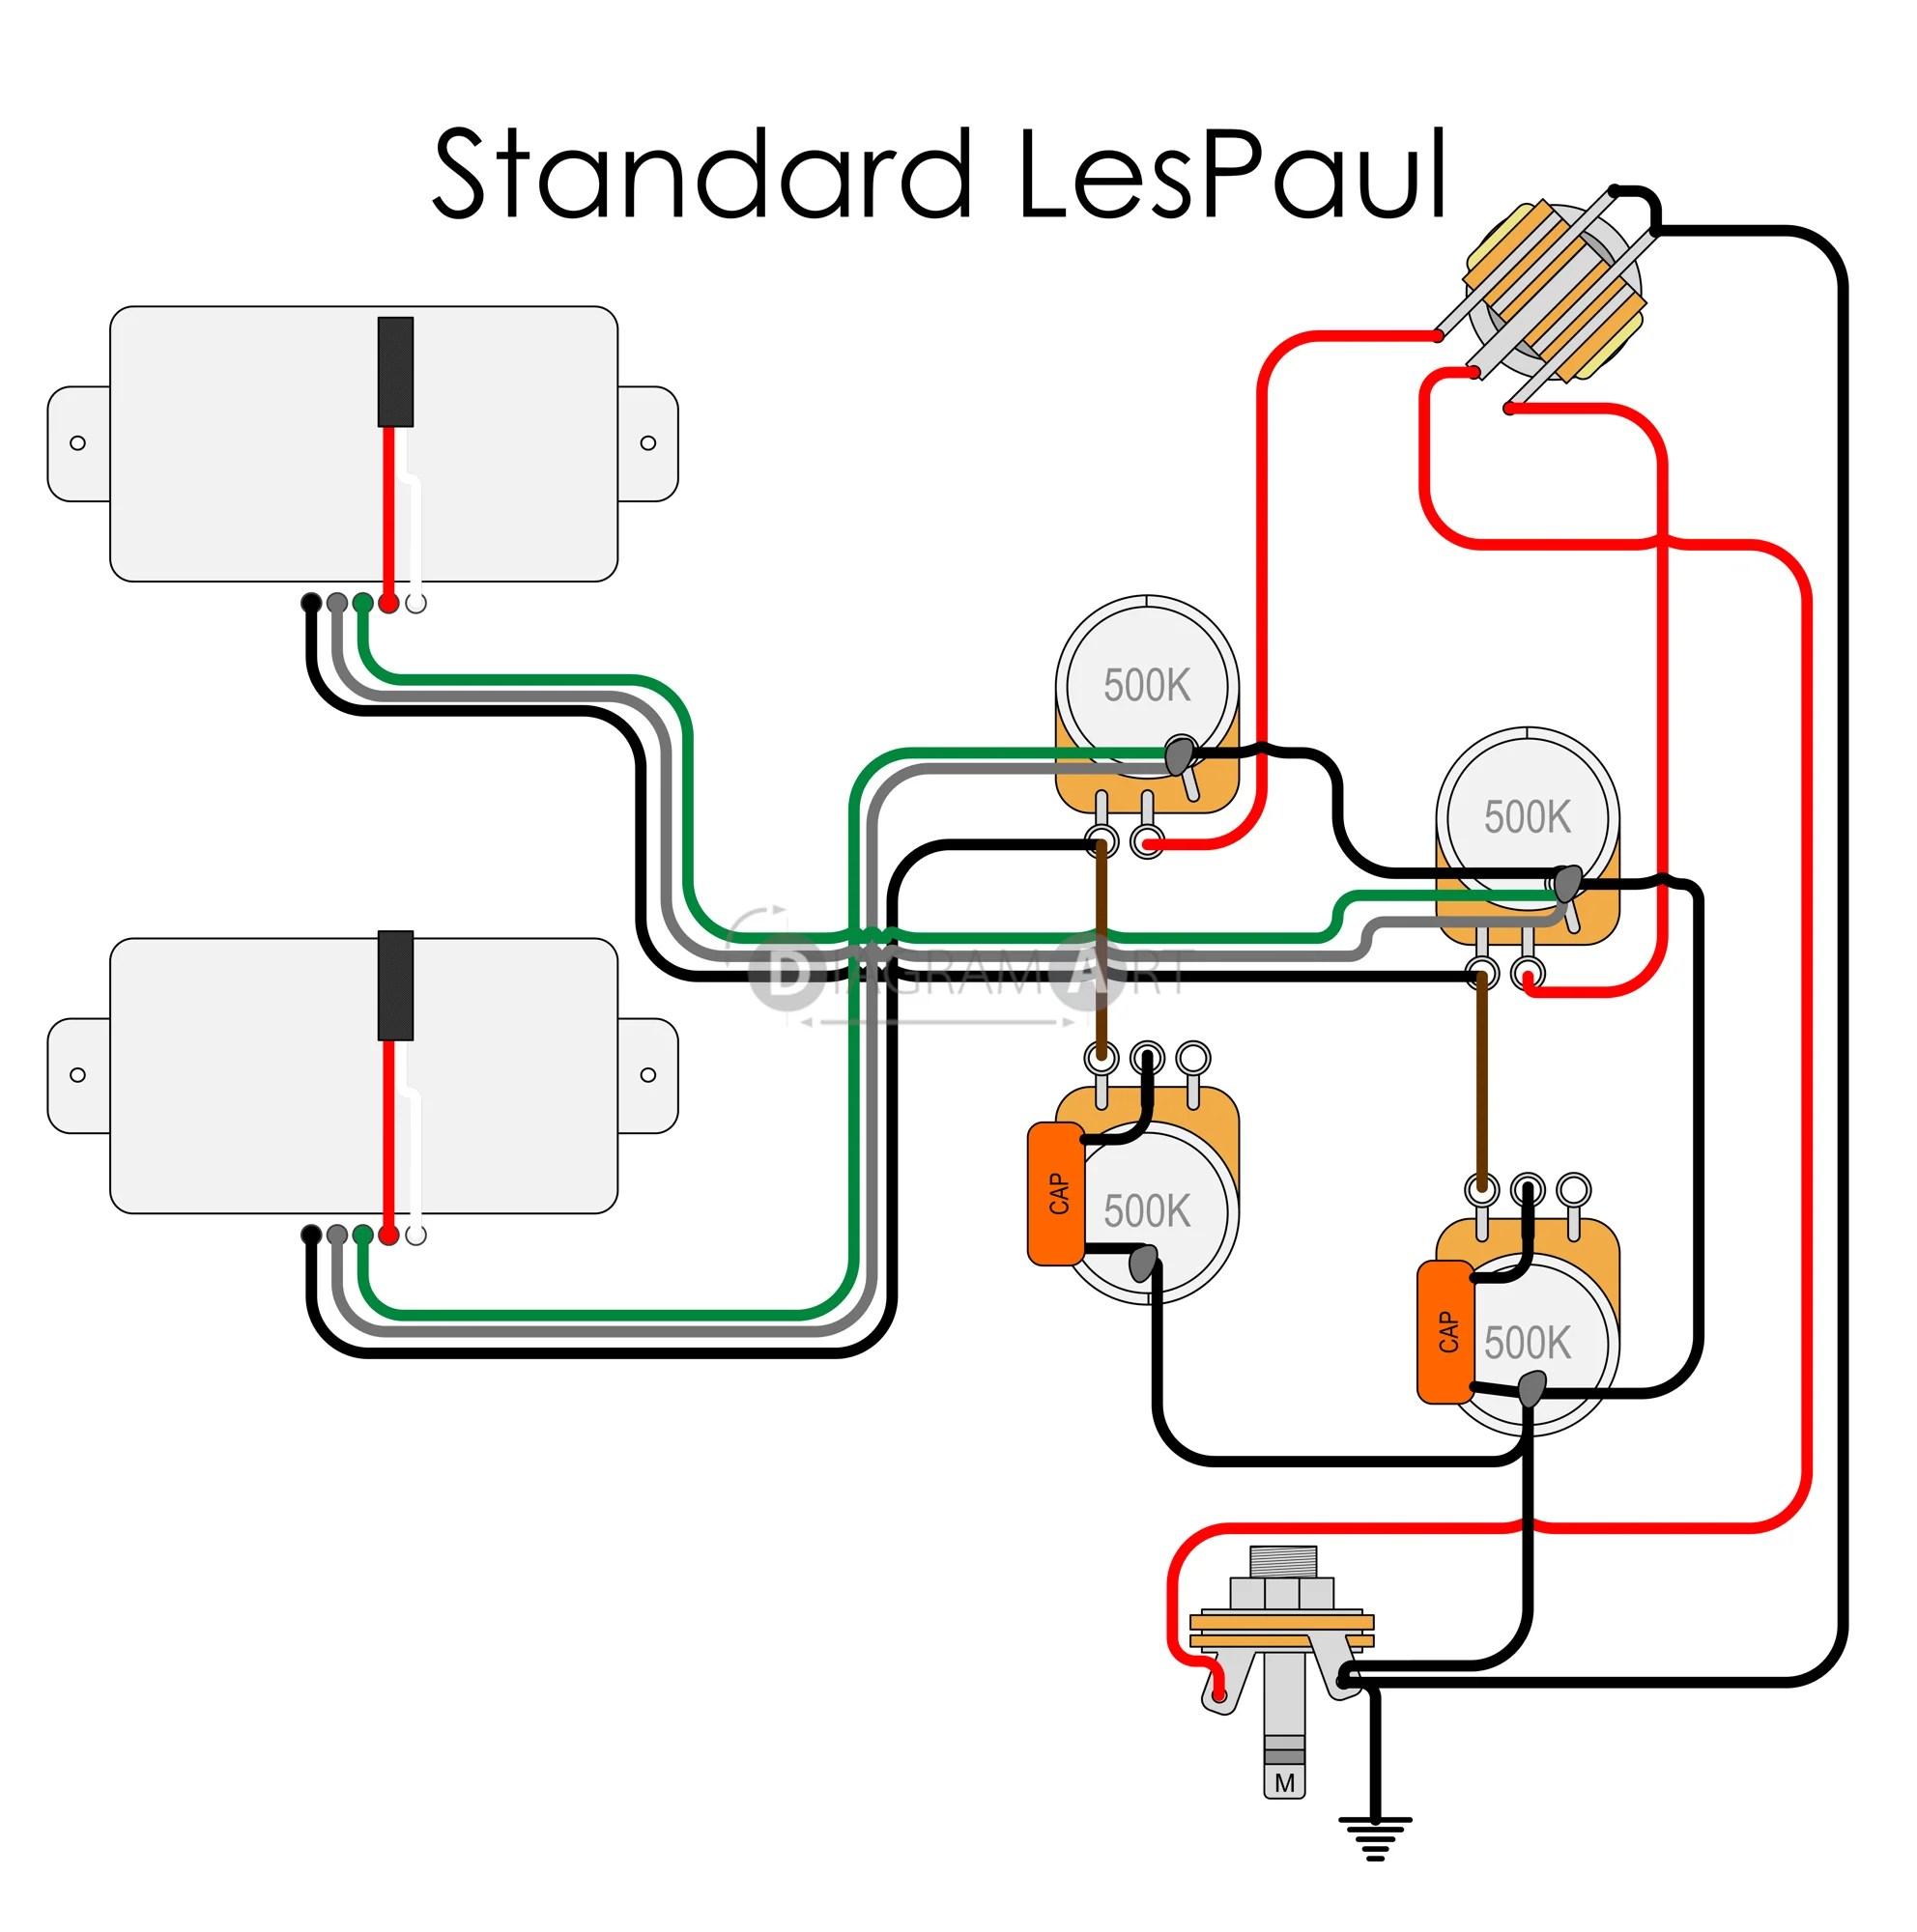 medium resolution of electric guitar wiring standard lespaul electric circuit diagramart les paul axcess wiring diagram standard les paul wiring diagram